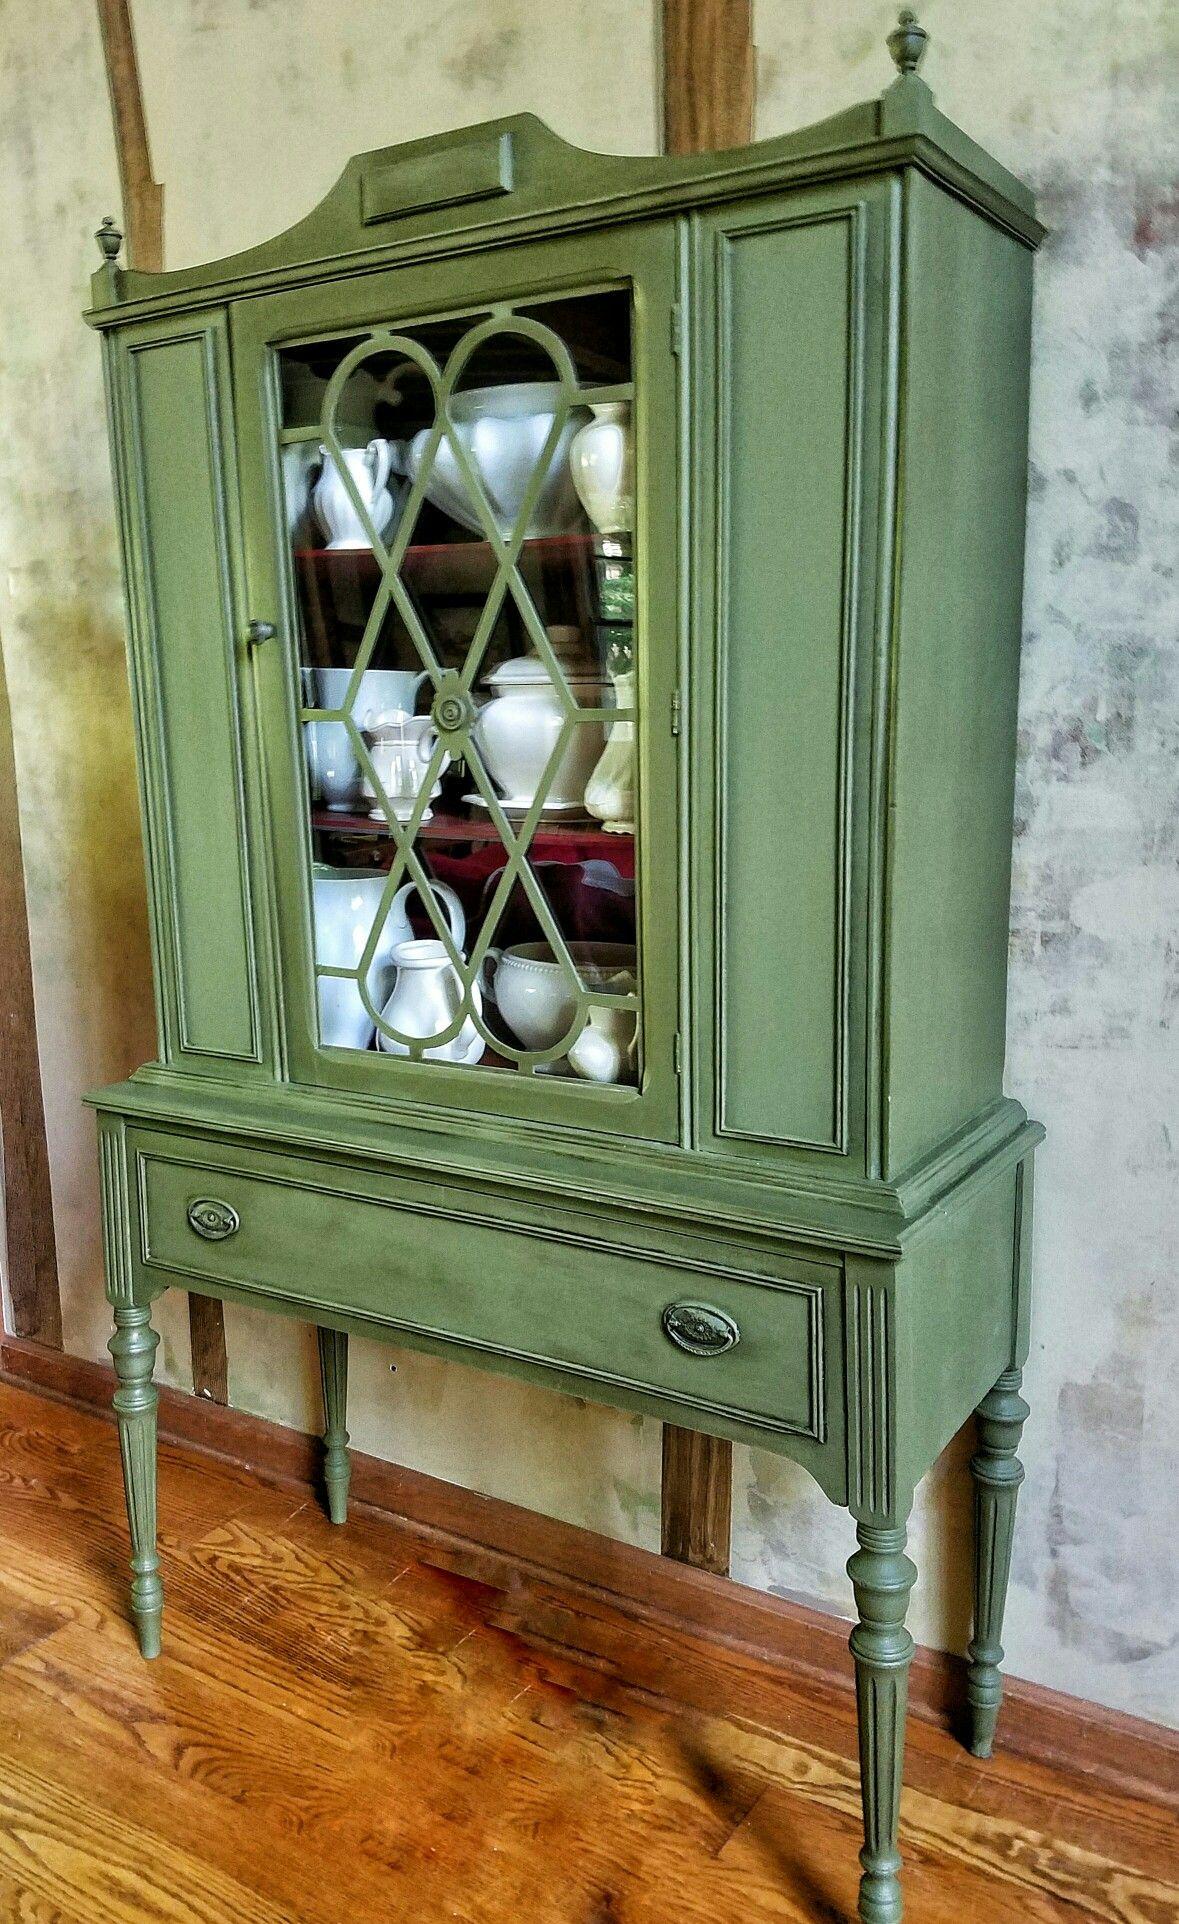 Annie Sloan Olive Emperor S Silk Interior Dark Waxed Antique Furniture Green Painted